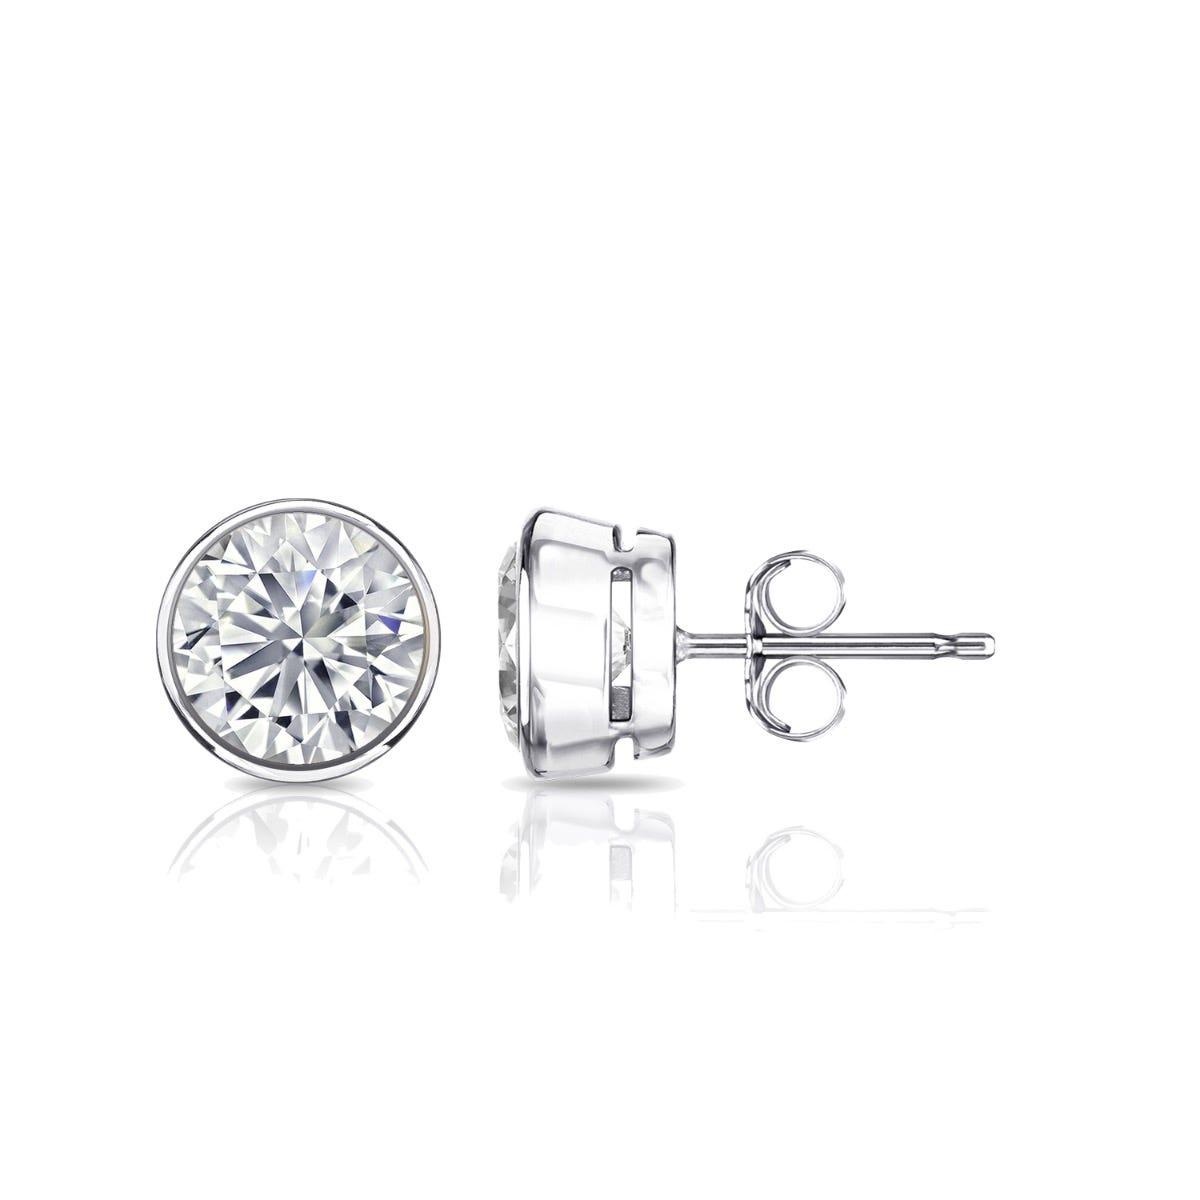 Diamond Round Bezel-Set 1ctw. Solitaire Stud (IJ-I1) Earrings in Platinum